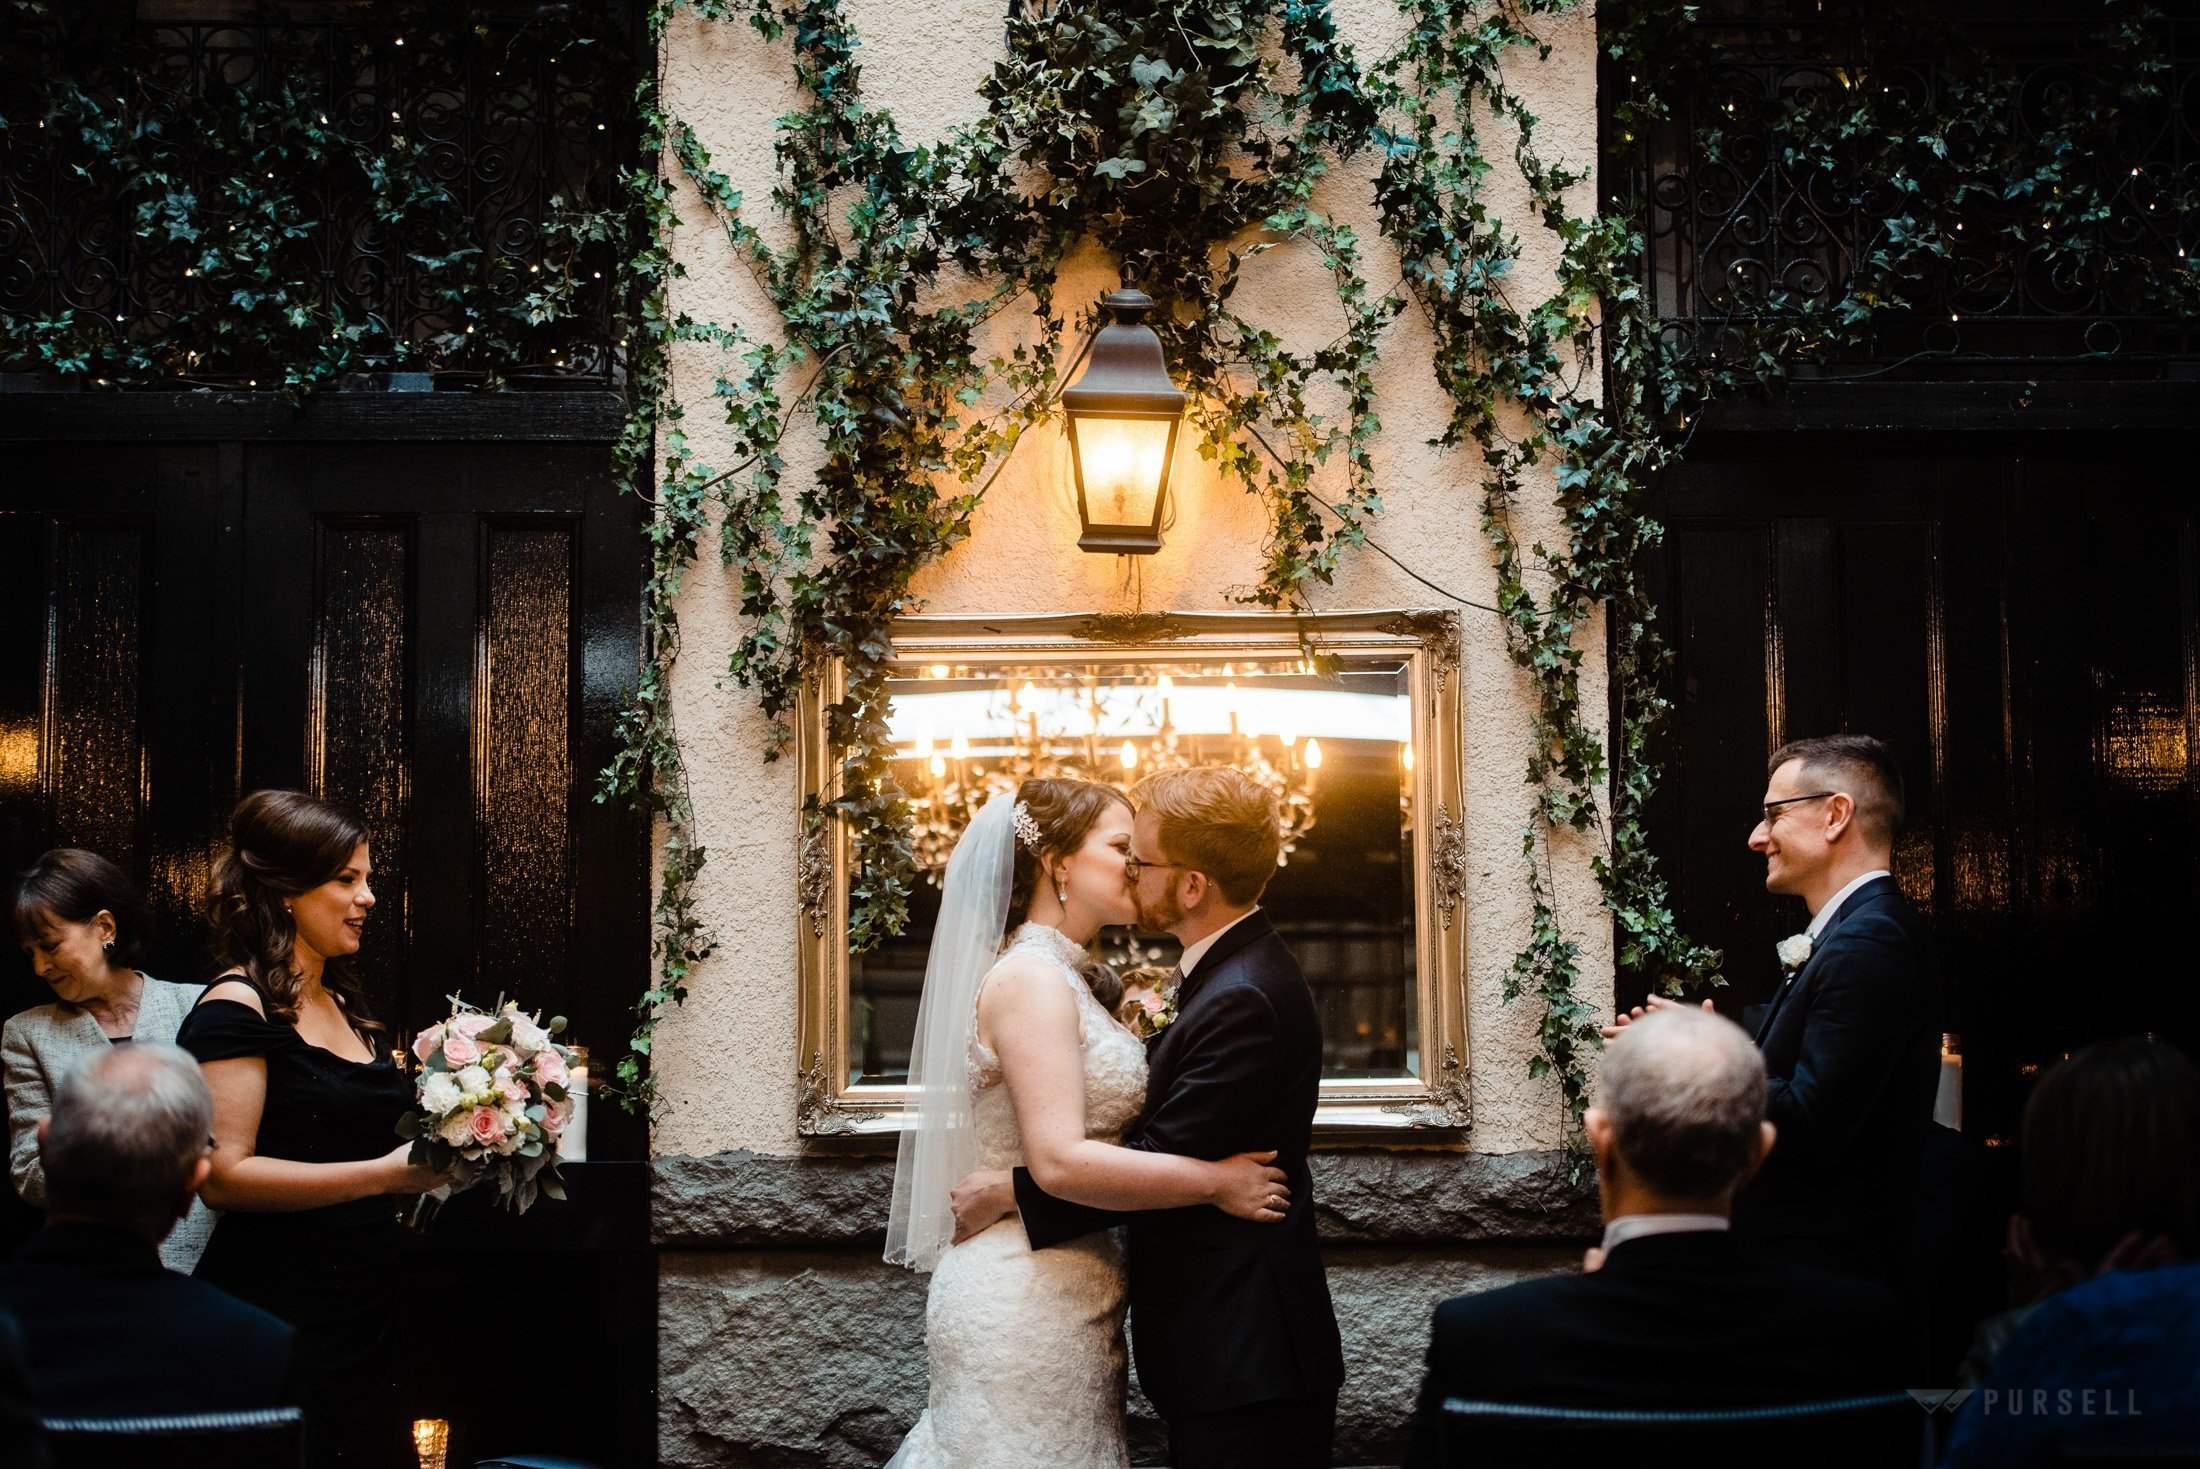 028 - intimate wedding ceremony location vancouver